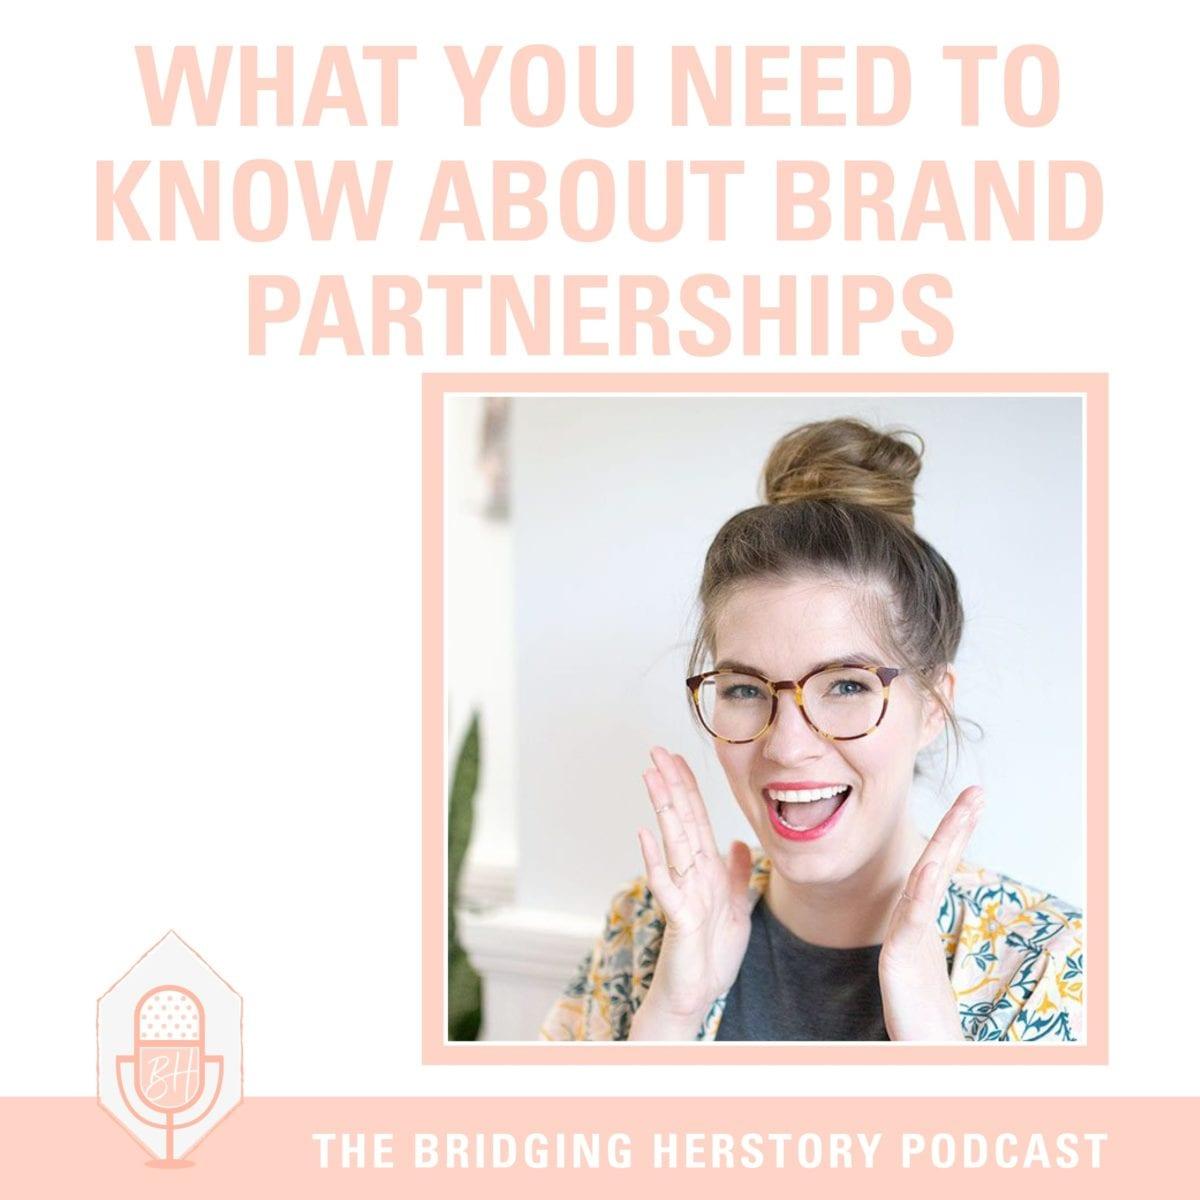 Bridging Herstory Podcast - Lindsay Ponta of Shrimp Salad Circus